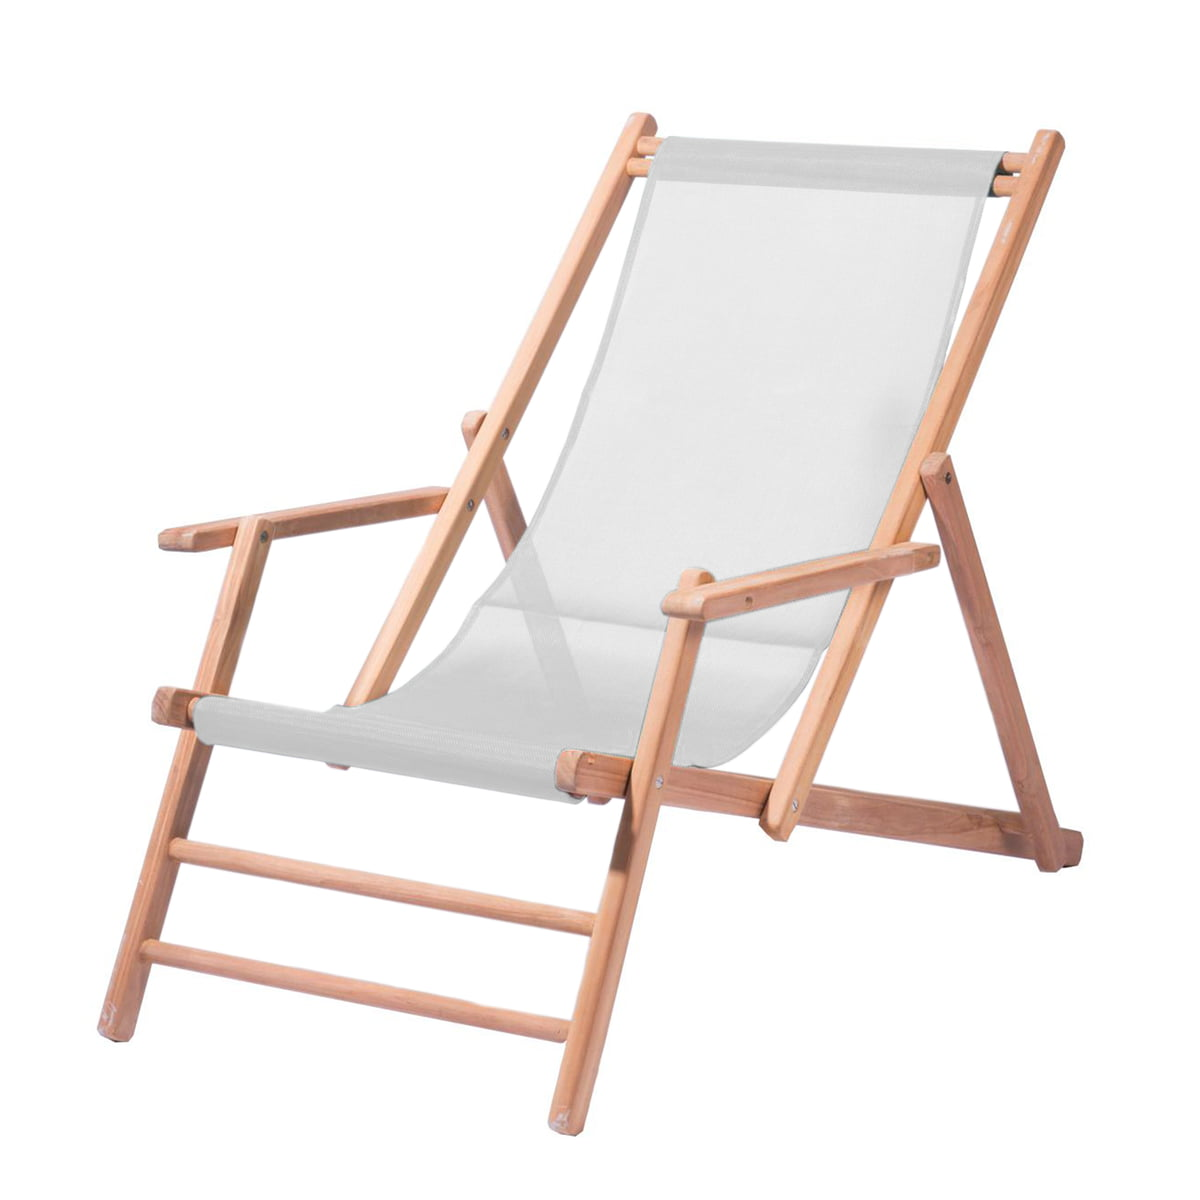 Jan Kurtz - Deckchair teak white fabric  sc 1 st  Connox Interior Design Shop & Deckchair Teak Wood by Jan Kurtz in the shop